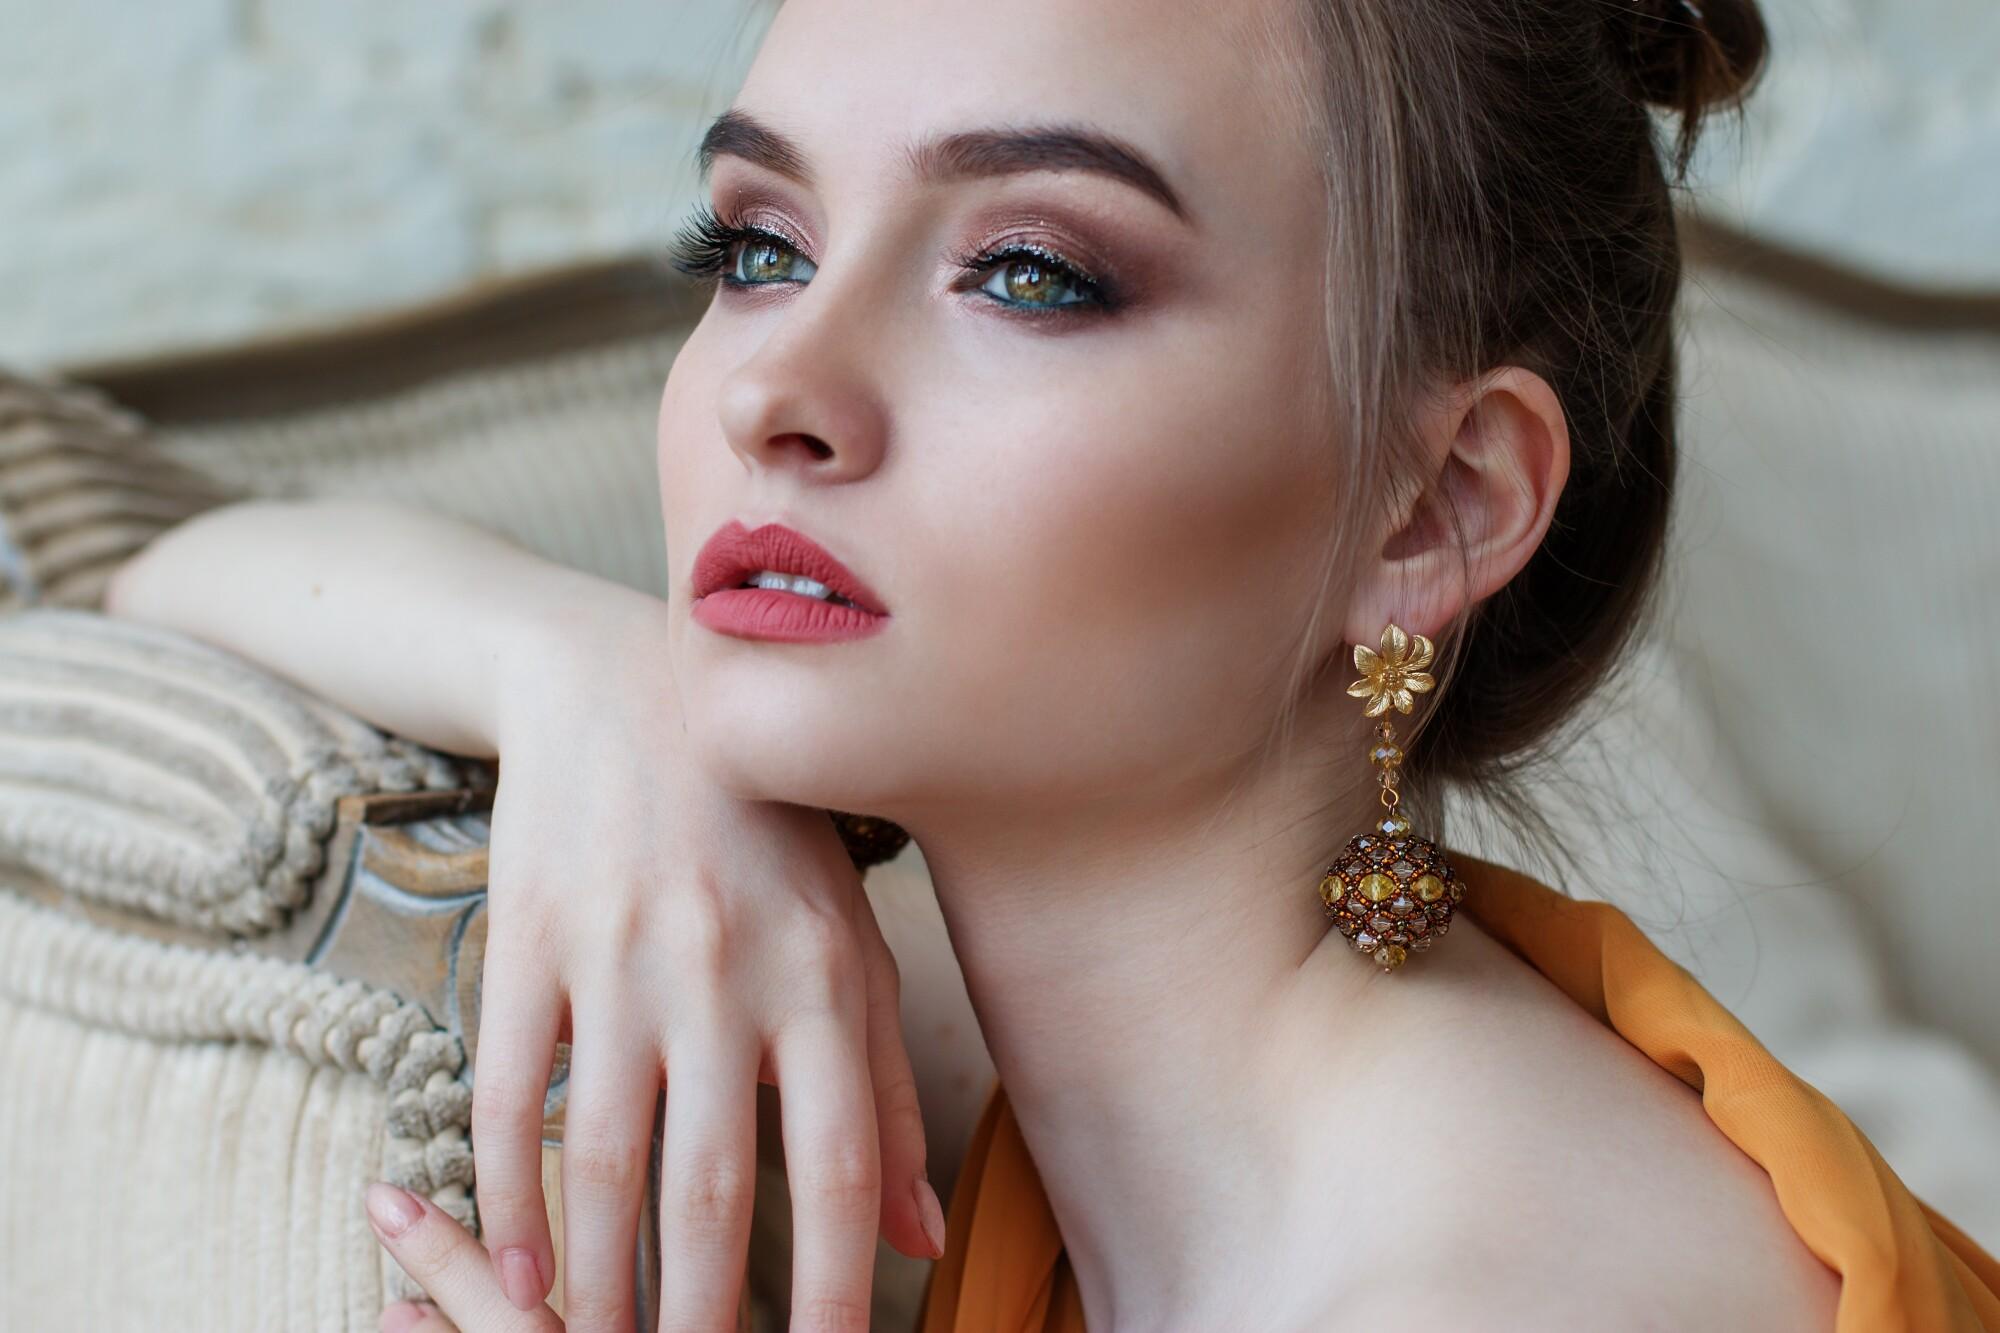 How to Determine Your Own Skin Undertones